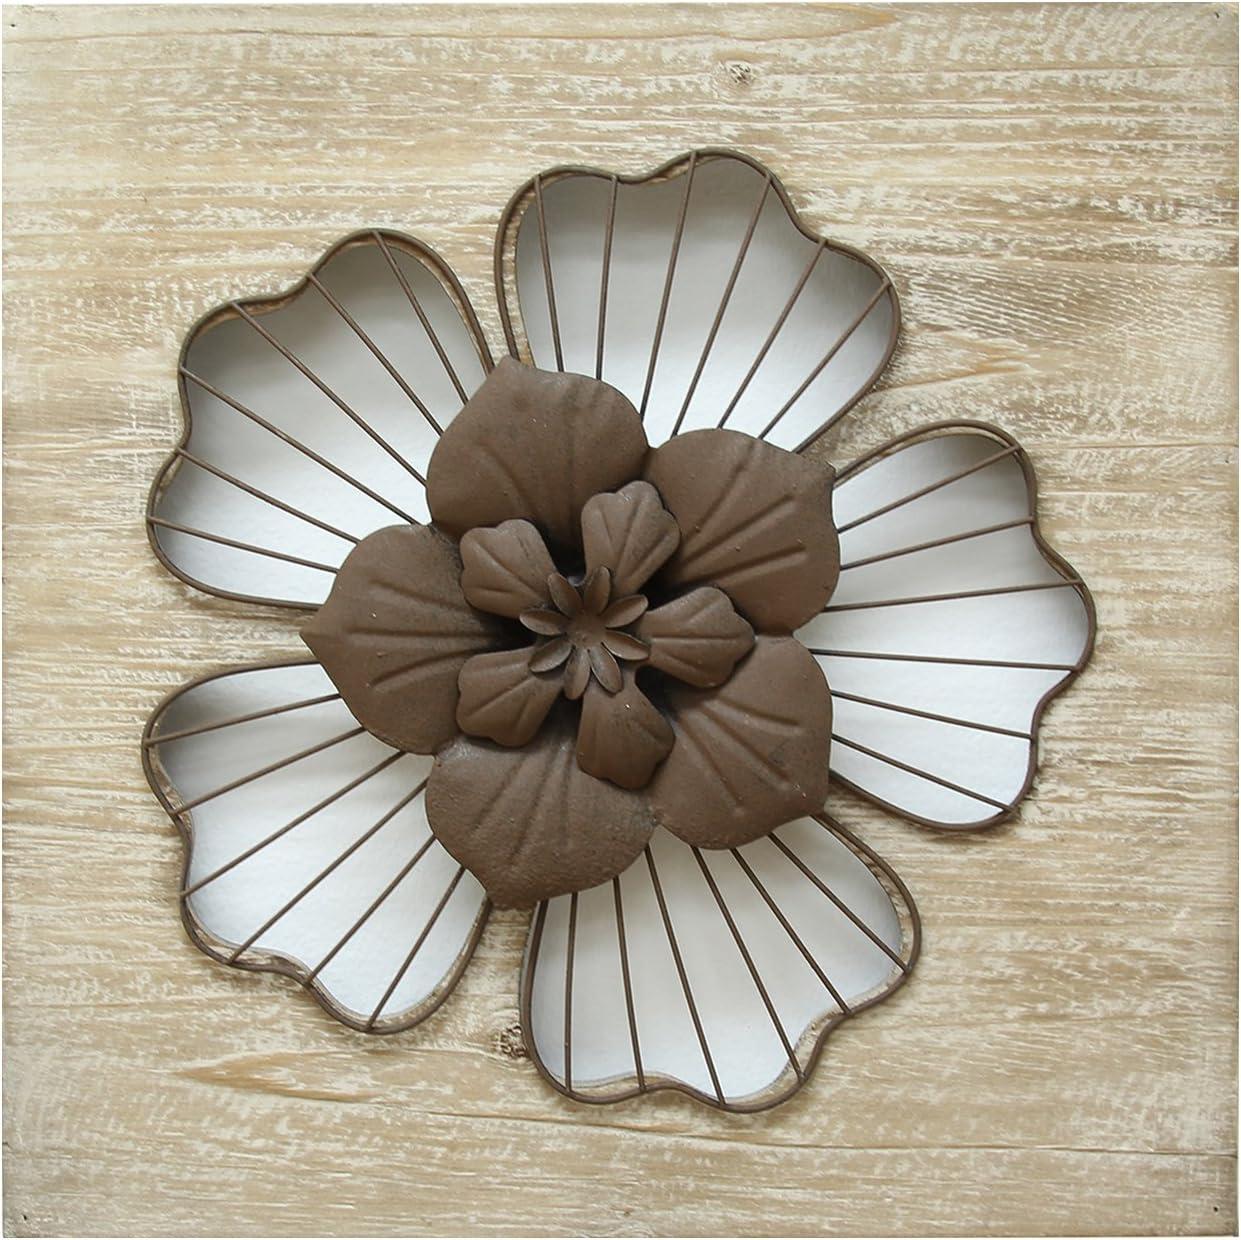 Stratton Home Decor SHD0168 Flower Wall Decor, Rustic, 14.00 W X 1.50 D X 14.00 H, Natural Wood Espresso